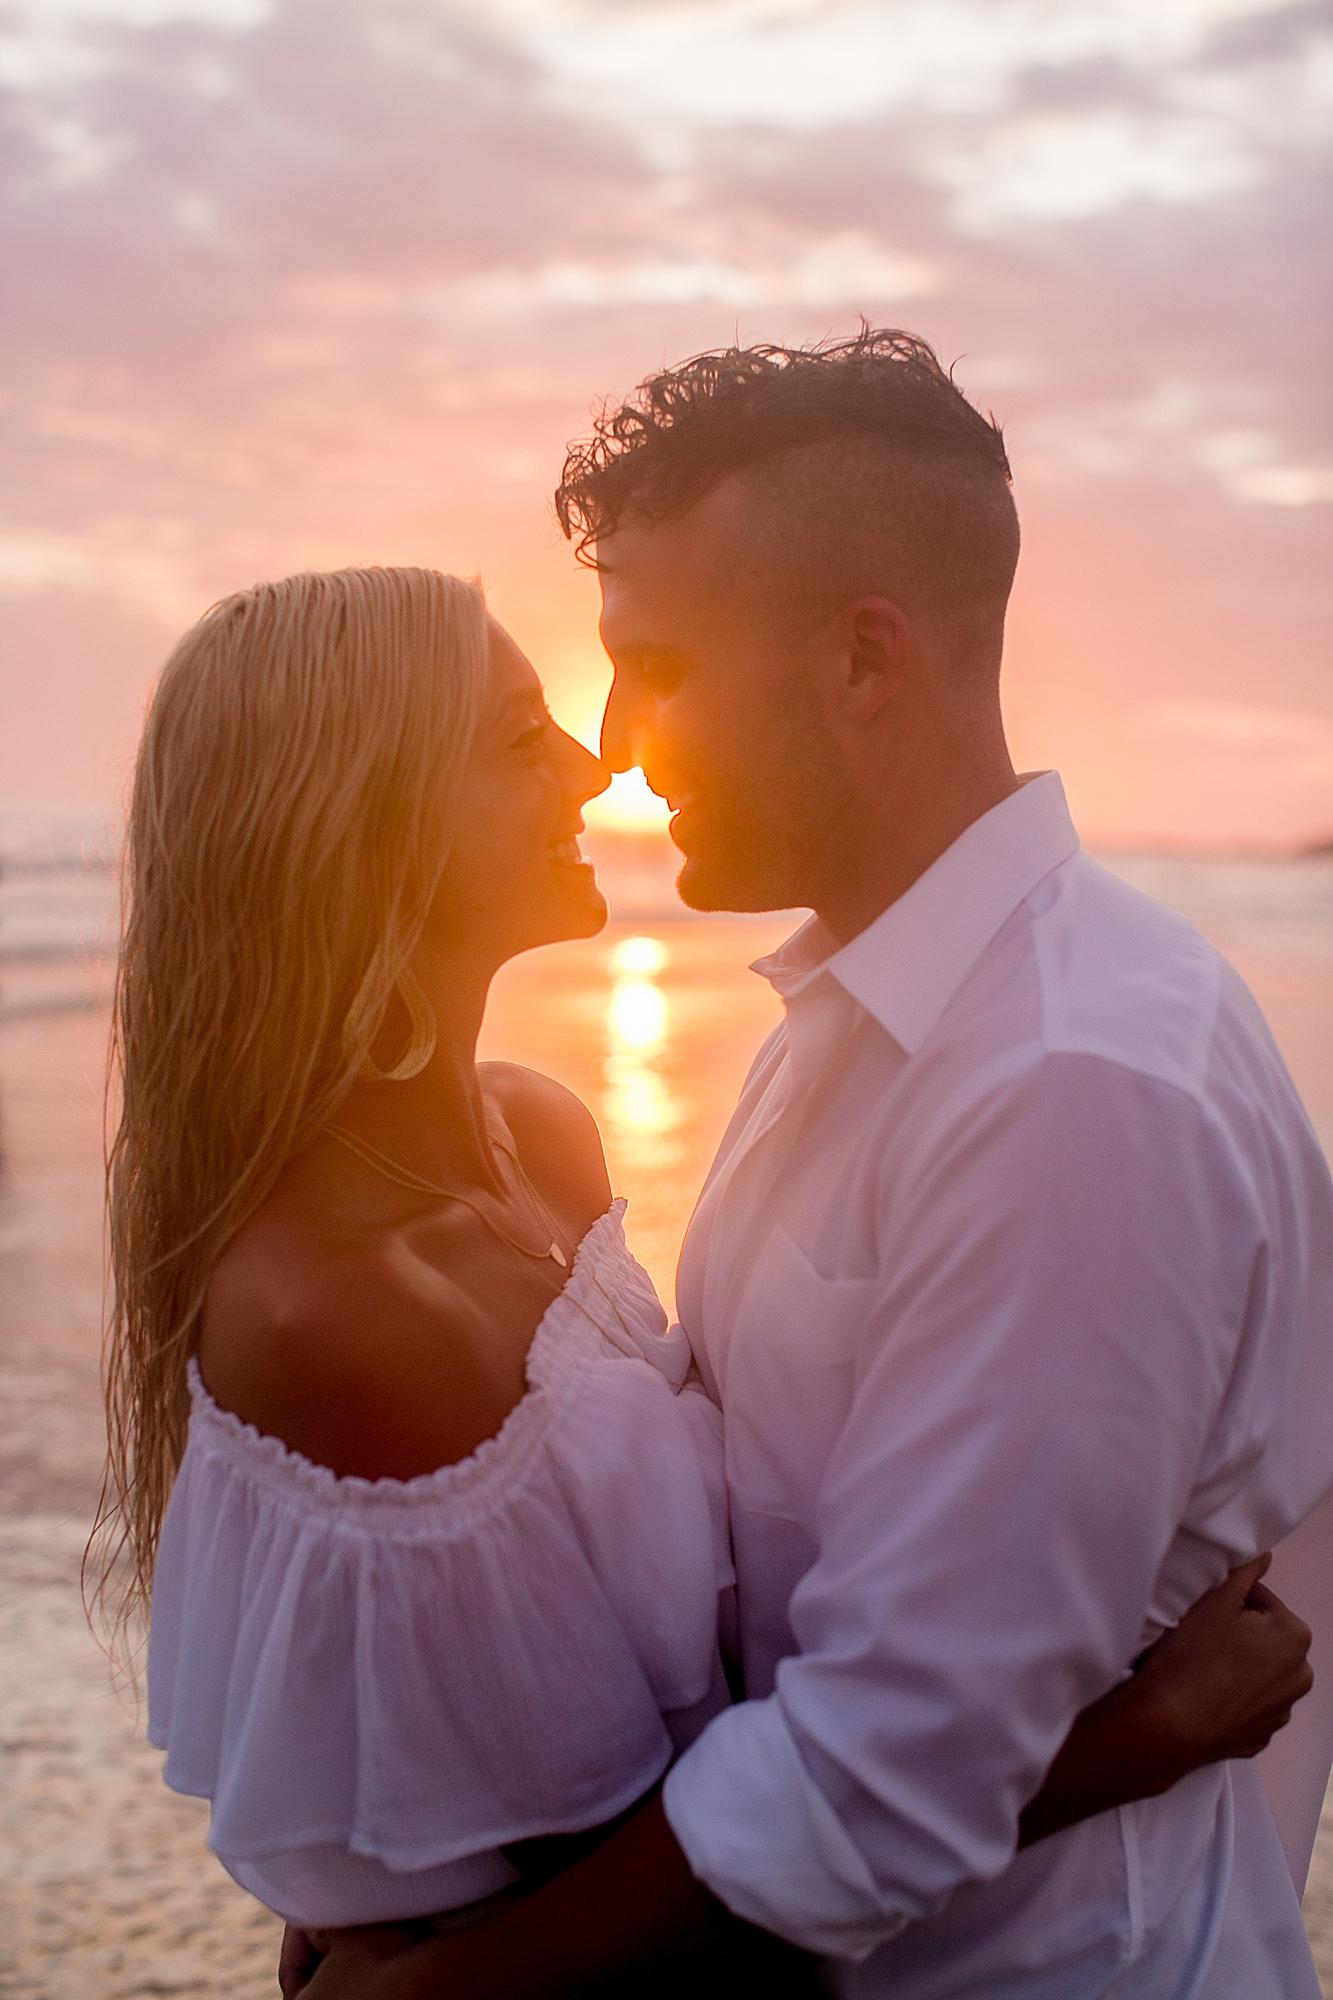 Epic and Adventurous Travel Wedding and Portrait Photographer in Nosara, Costa Rica - Kelee Bovelle @xokelee @keleeb - 3.jpg